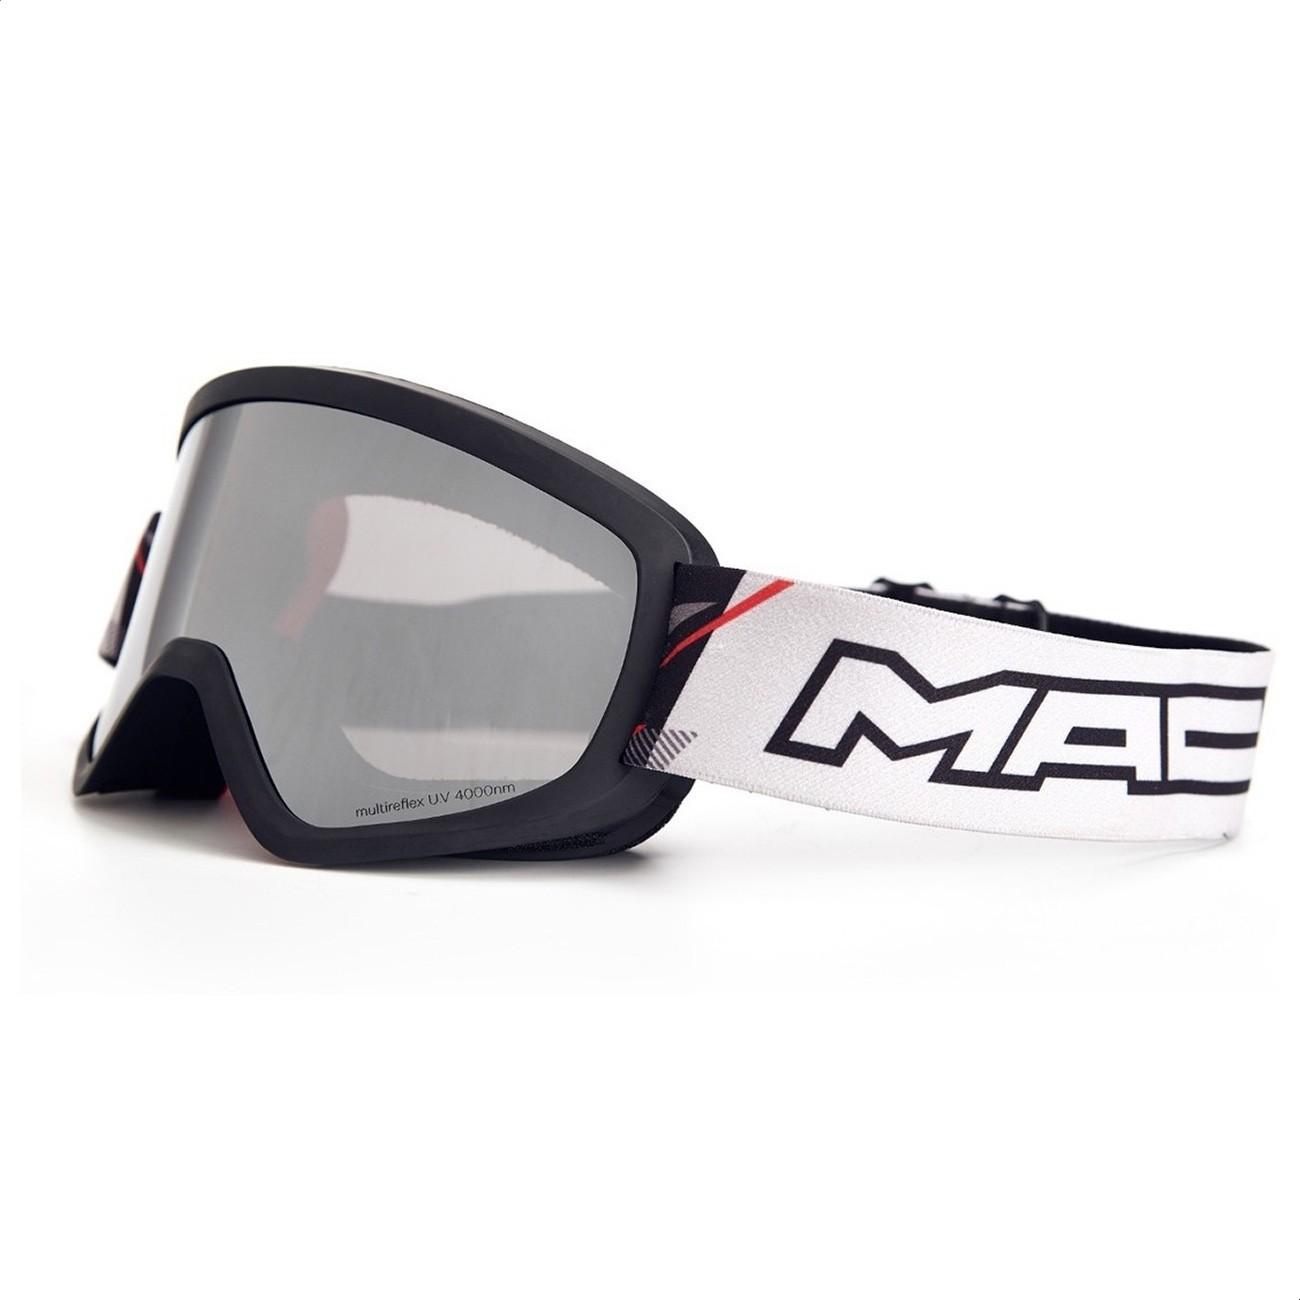 Antiparras Enduro Motocross MAC Prisma Negro Gris